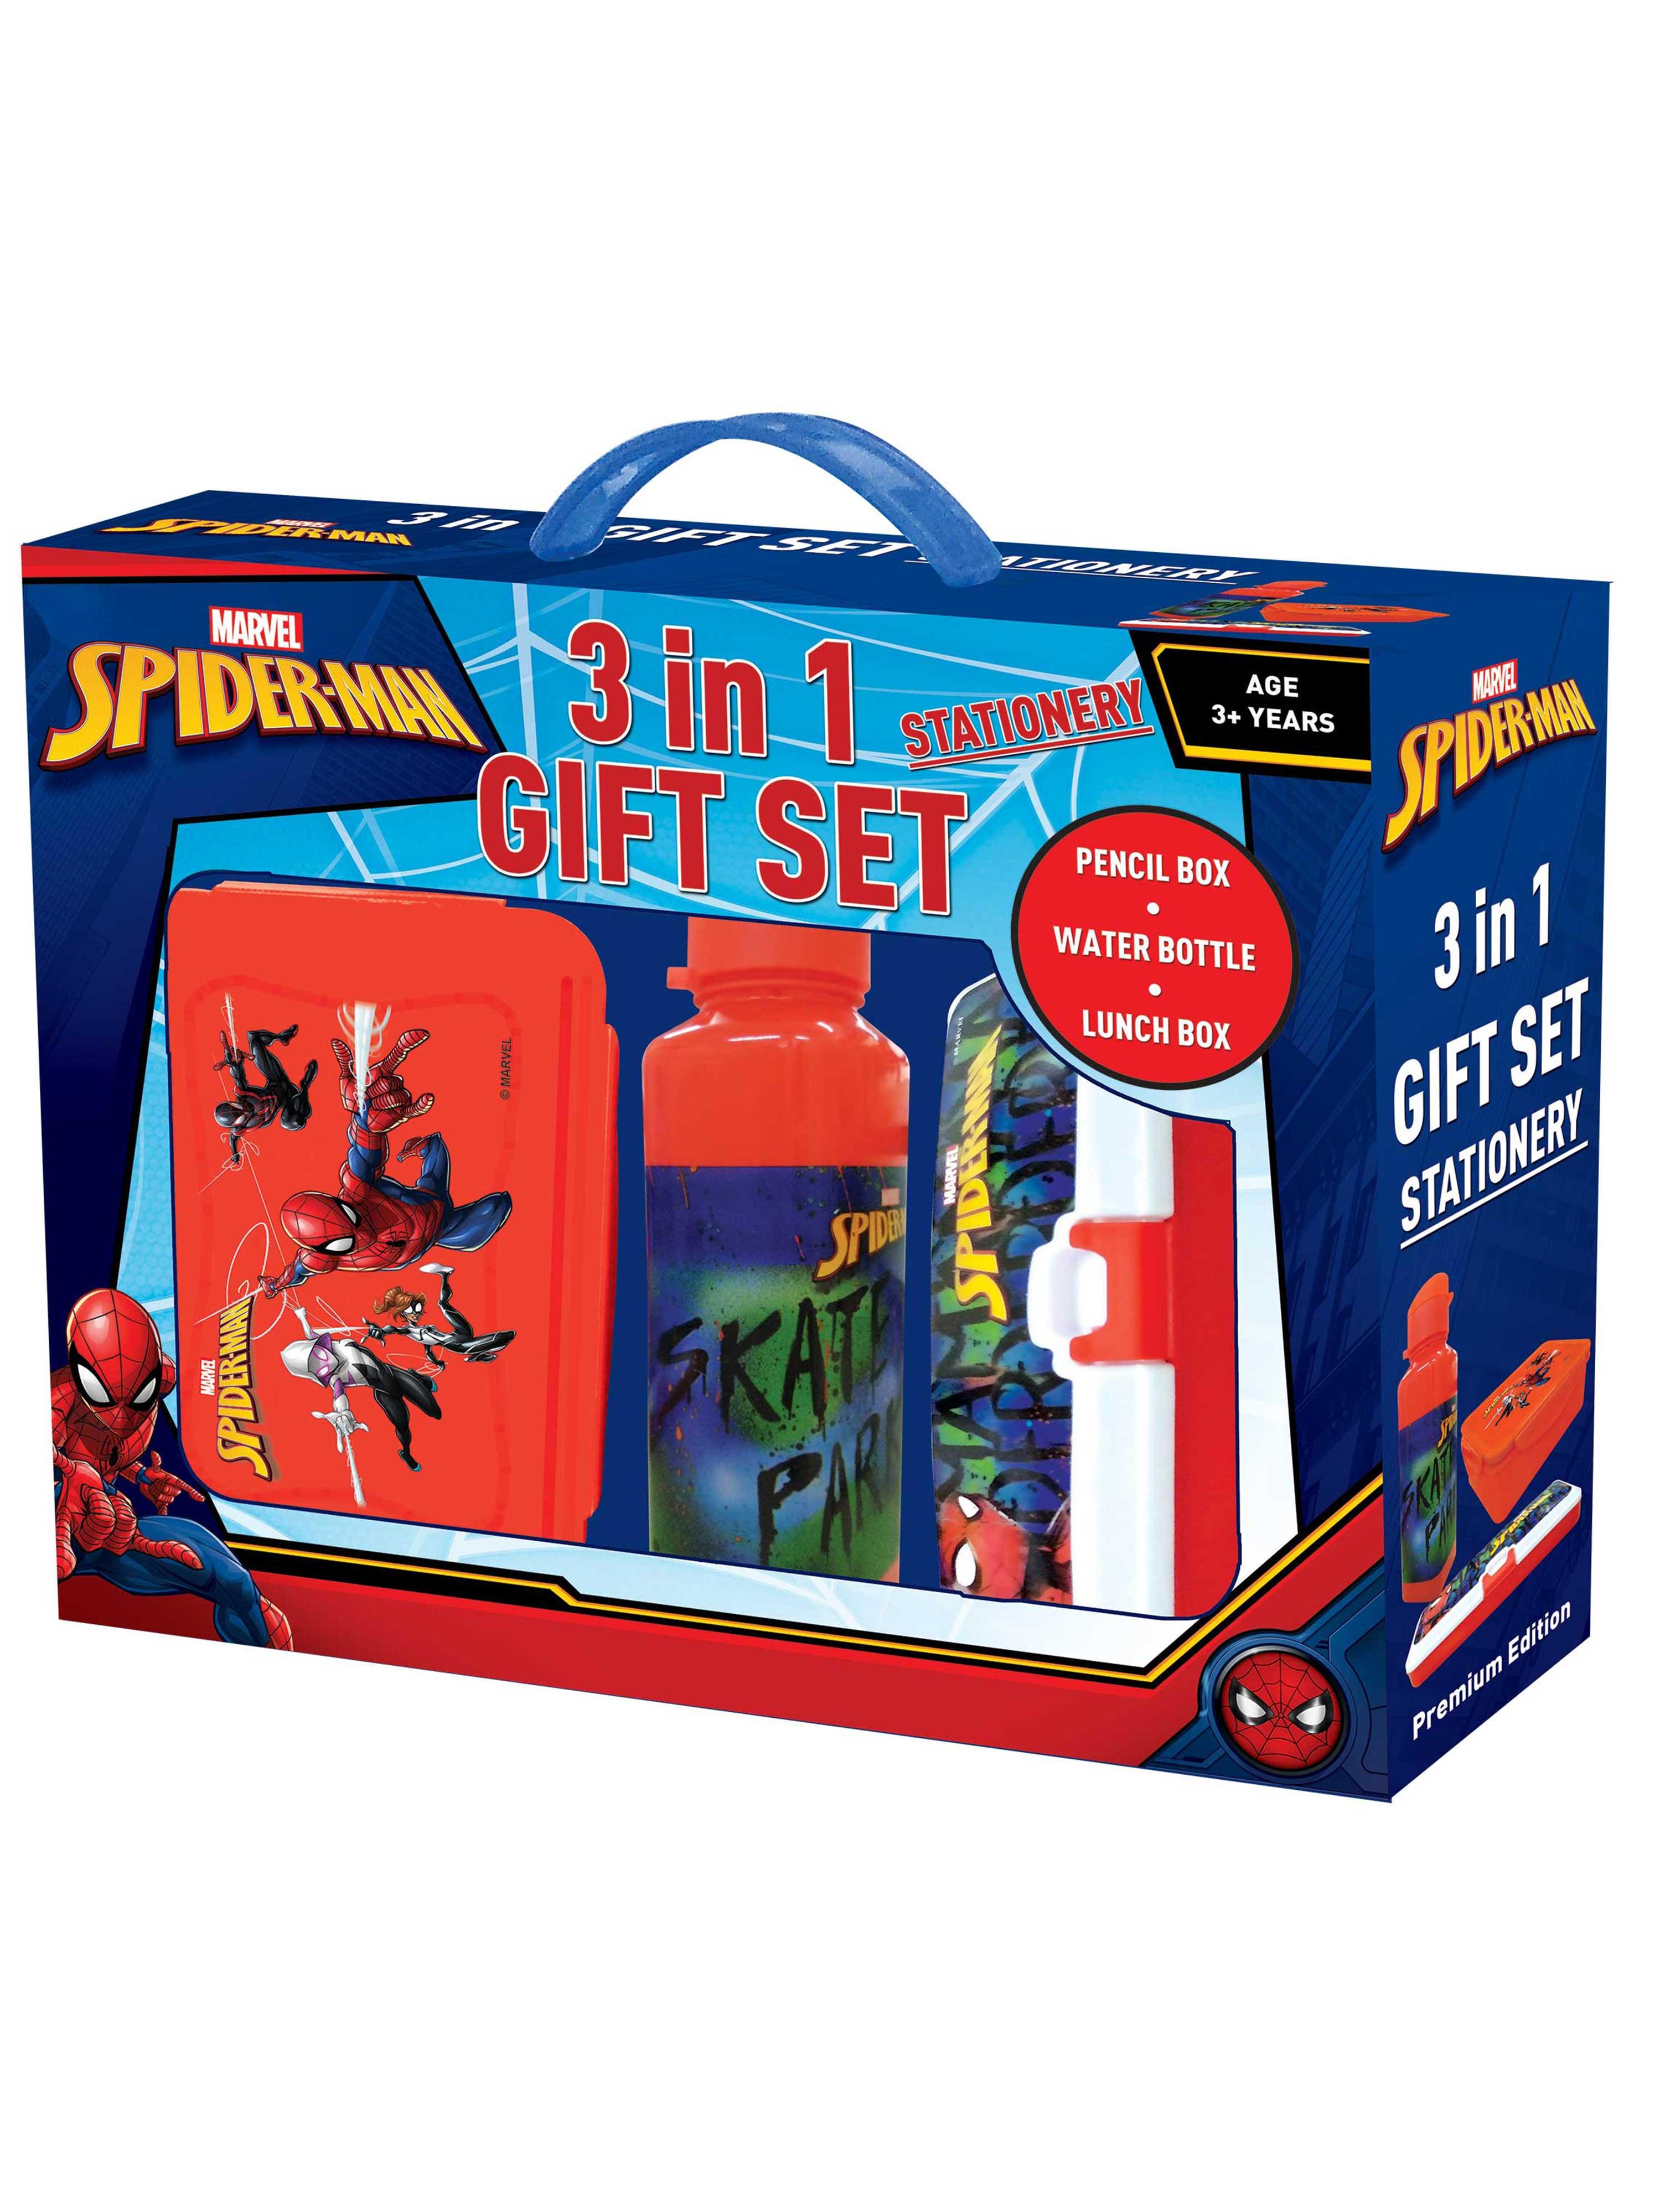 Marvel Spiderman 3 in 1 Gift Set